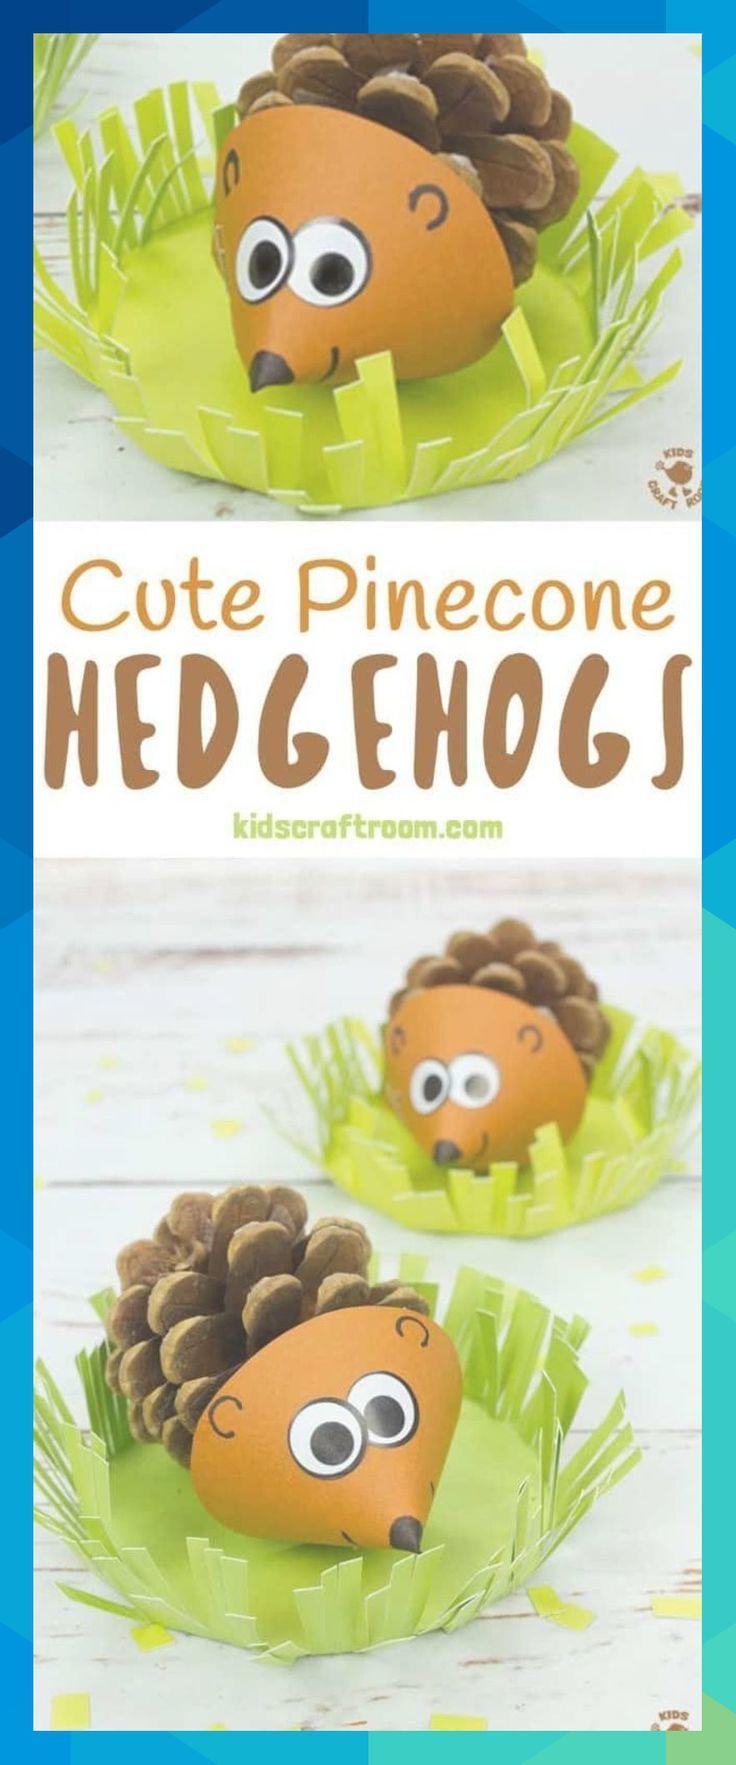 pinecone pinecones hedgehog hedgehogs hedgehogcrafts